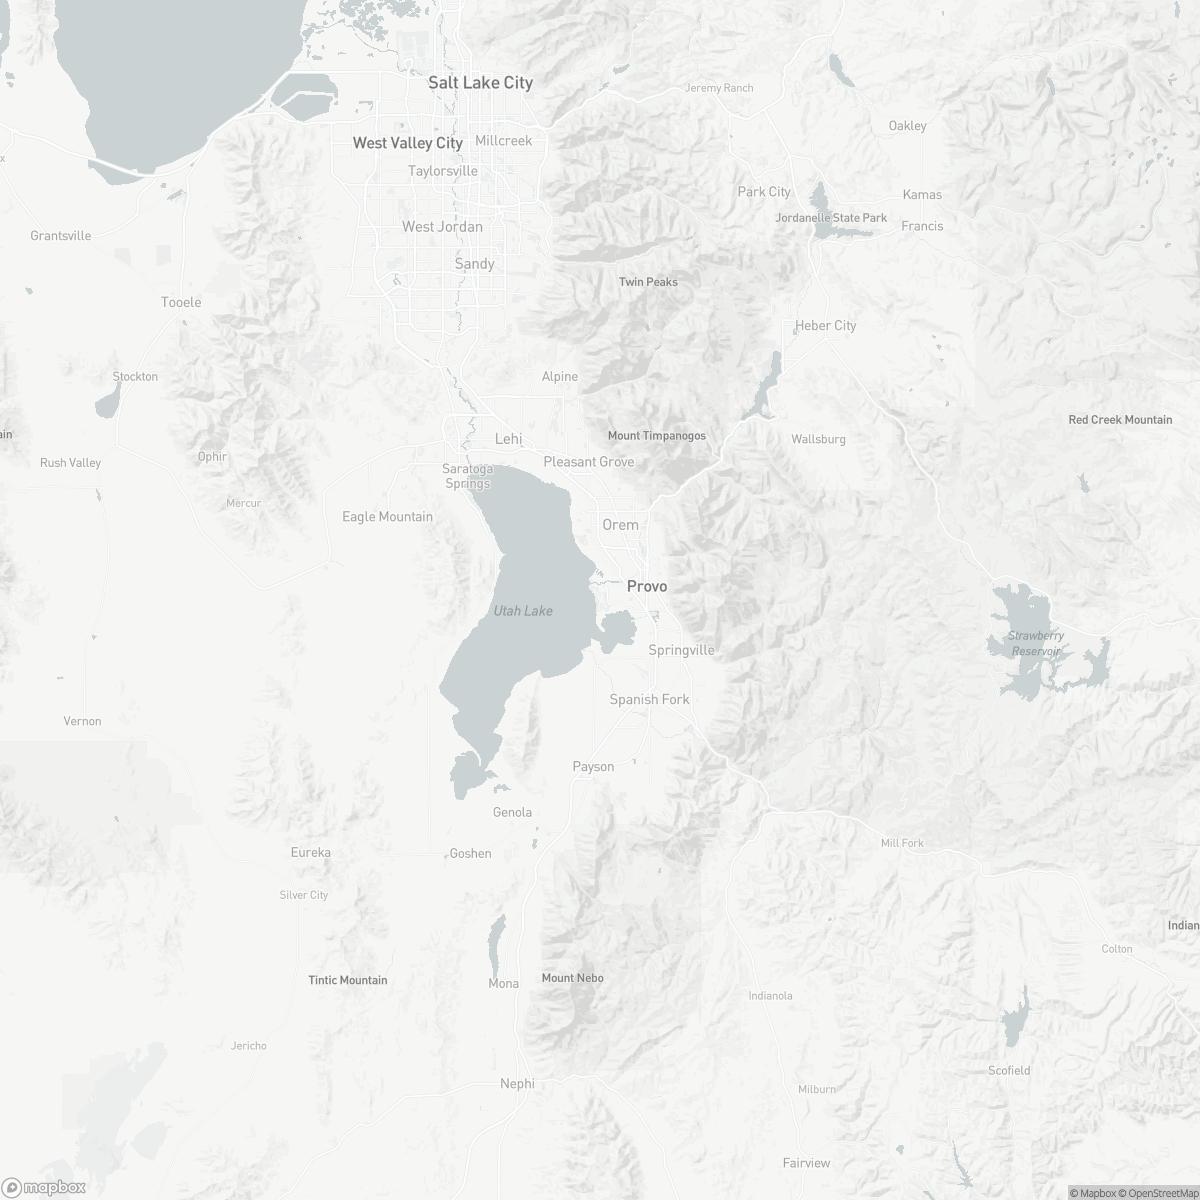 Map of Provo Municipal Airport PVU surrounding area of Provo Utah